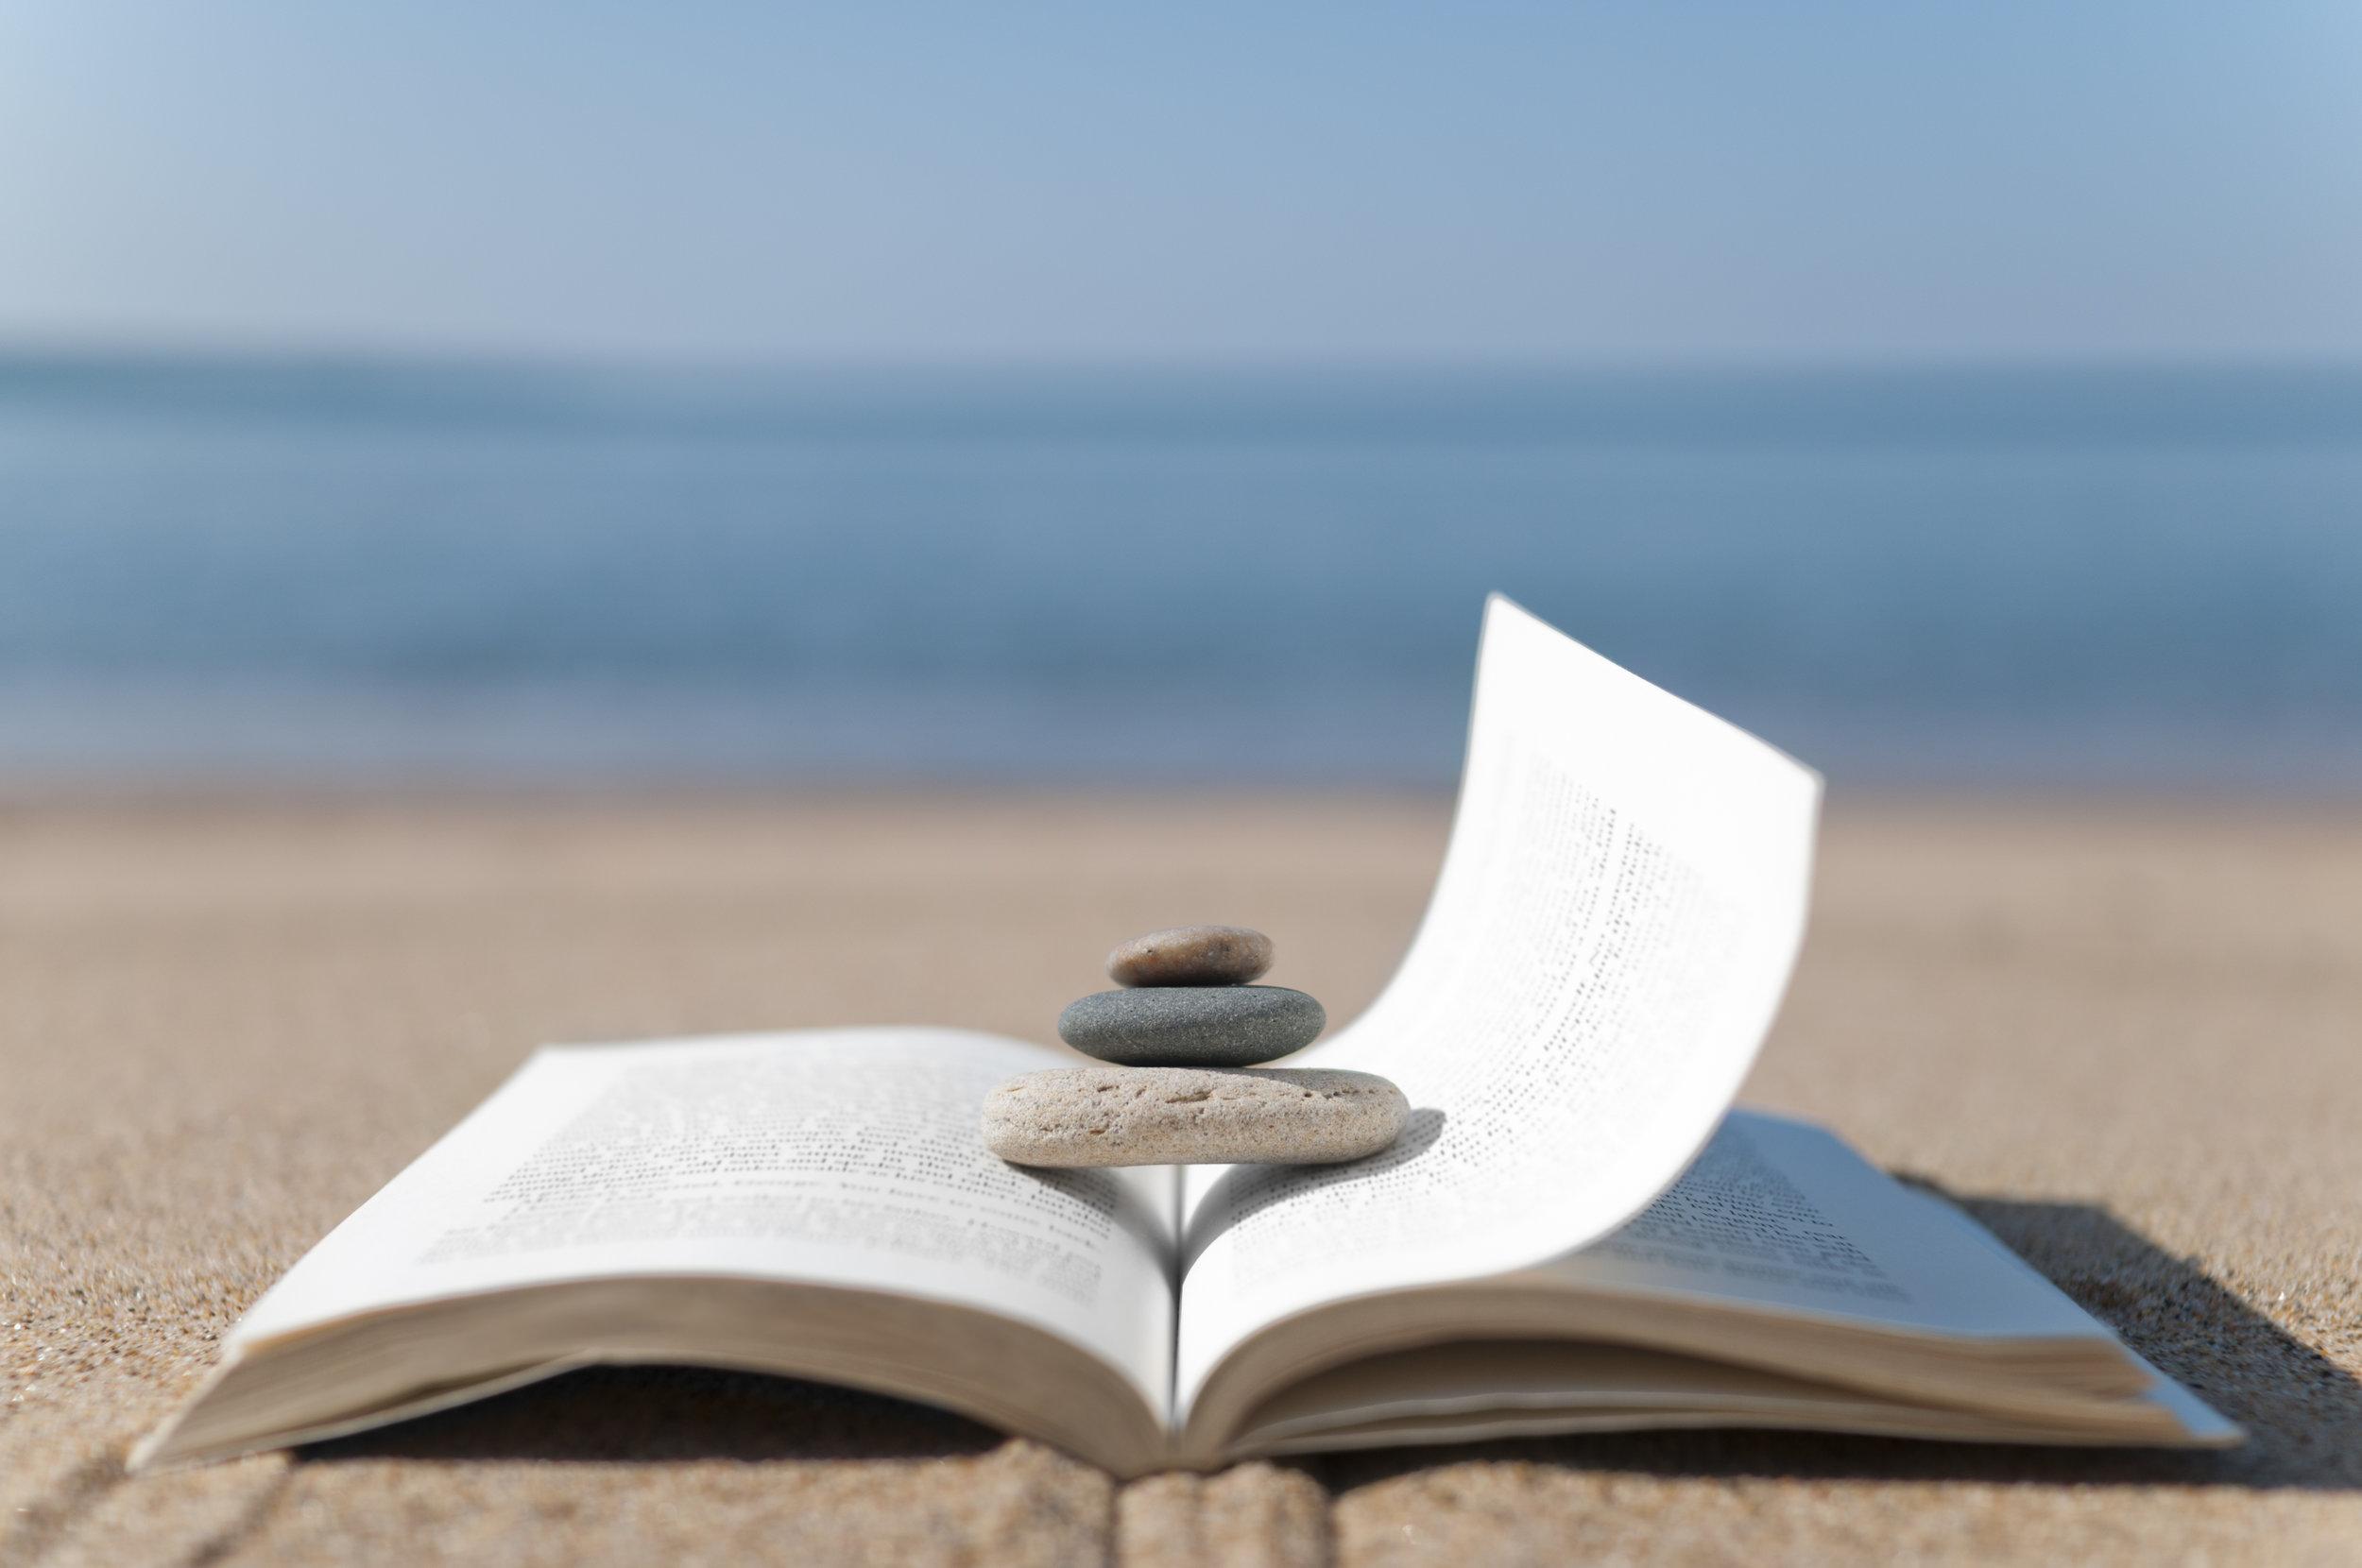 book on beach.jpg